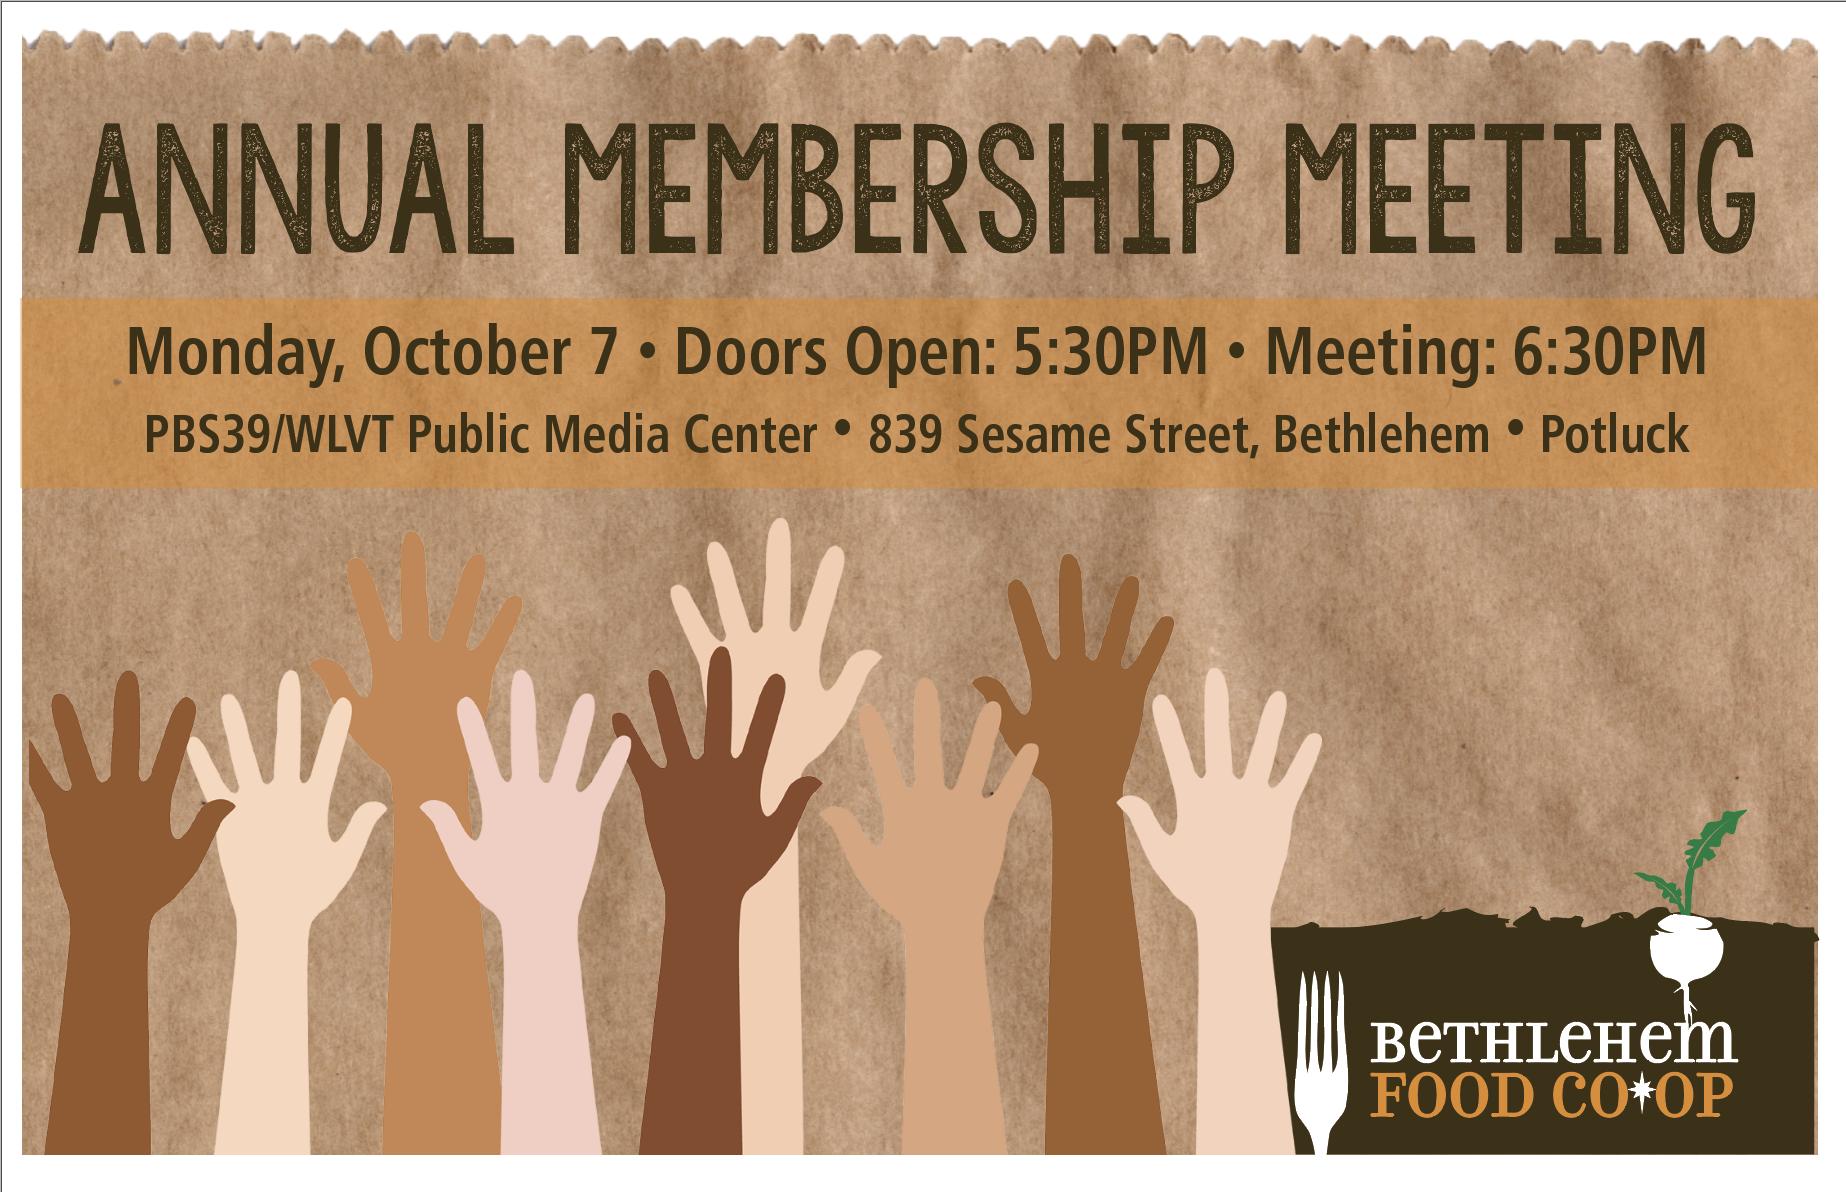 Annual Membership Meeting • Monday October 7, 2019 • Doors Open 5:30pm • Program 6:30pm